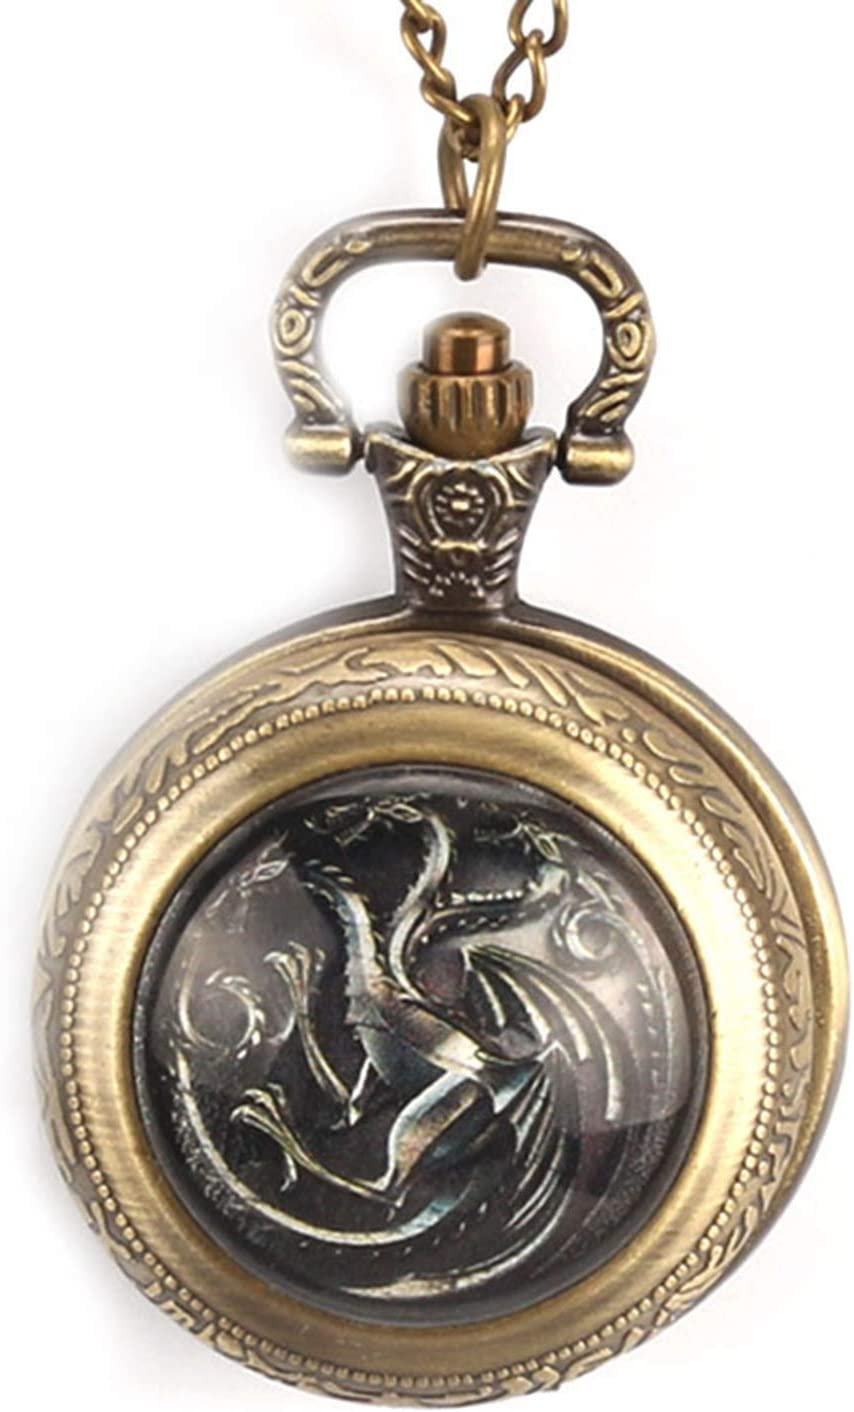 GAOFQ Reloj de Bolsillo Juego de Tronos Serie de televisión Estadounidense Reloj de Bolsillo temático para Hombres y Mujeres, Reloj de Bolsillo conmemorativo para Regalo